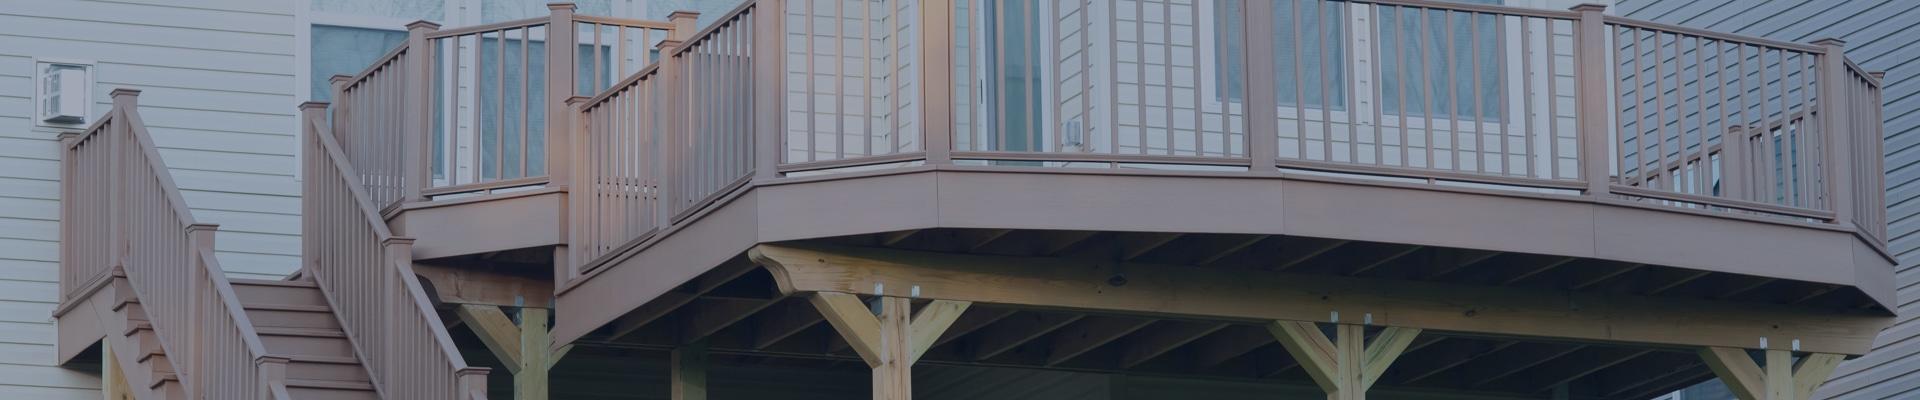 Mod les balcons en fibre de verre balcon nr - Patio fibre de verre prix ...